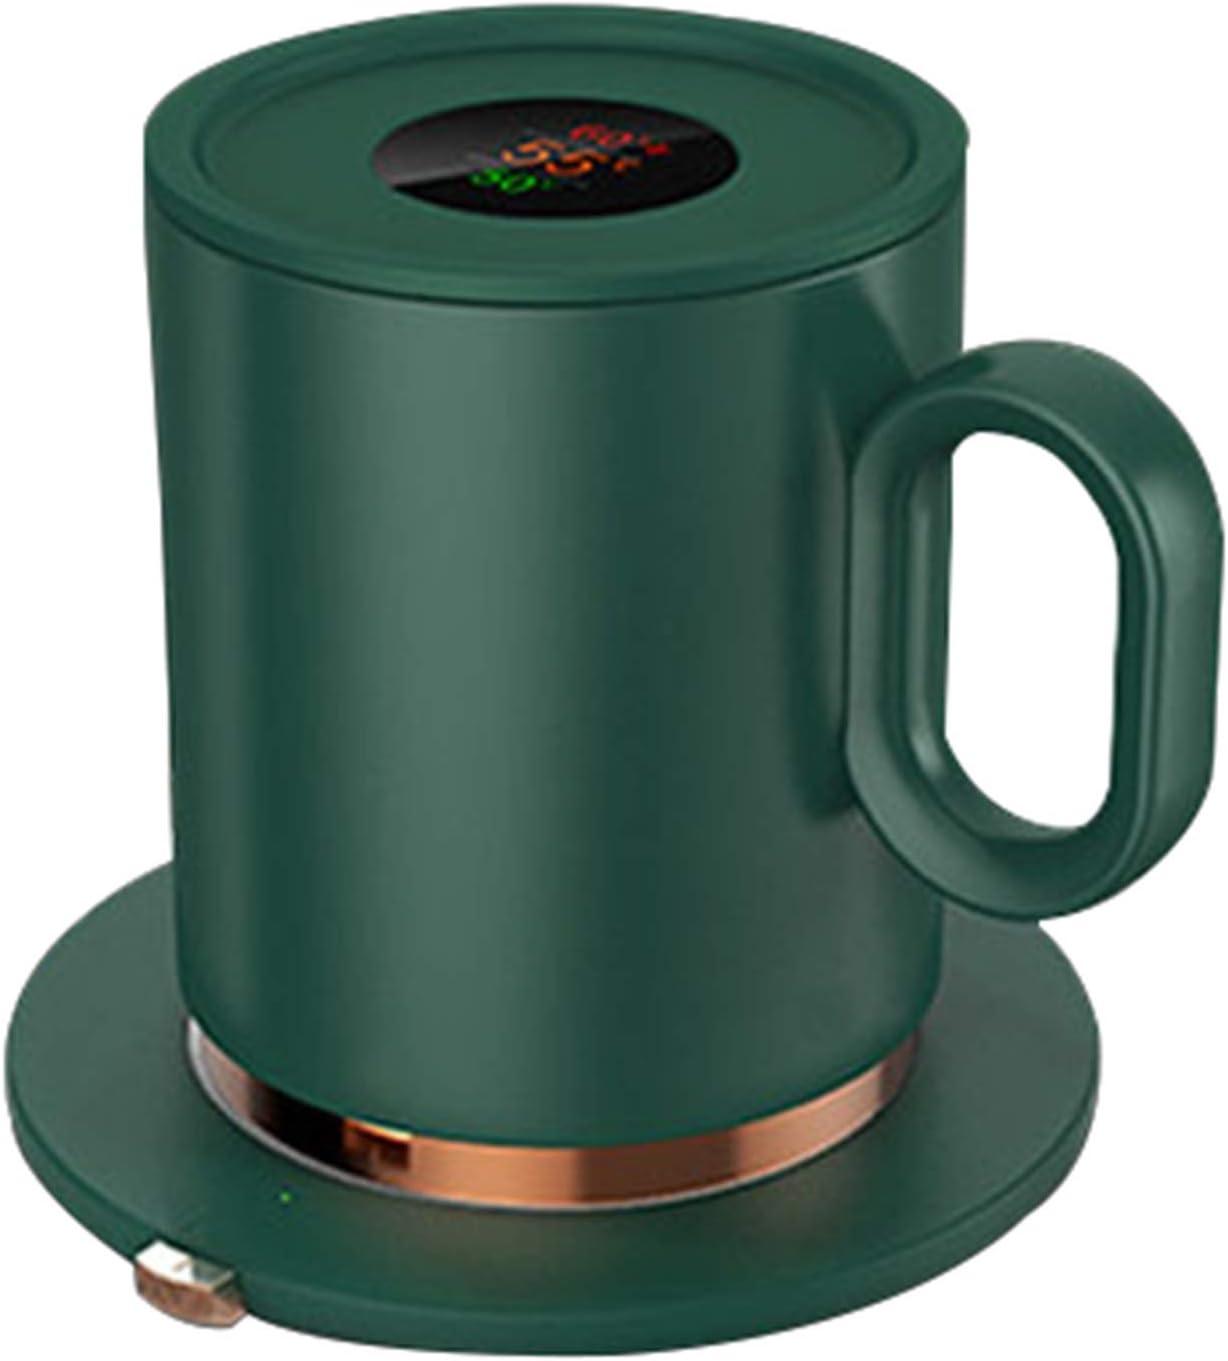 Coffee Fashion Mug Warmer Smart with D 2021